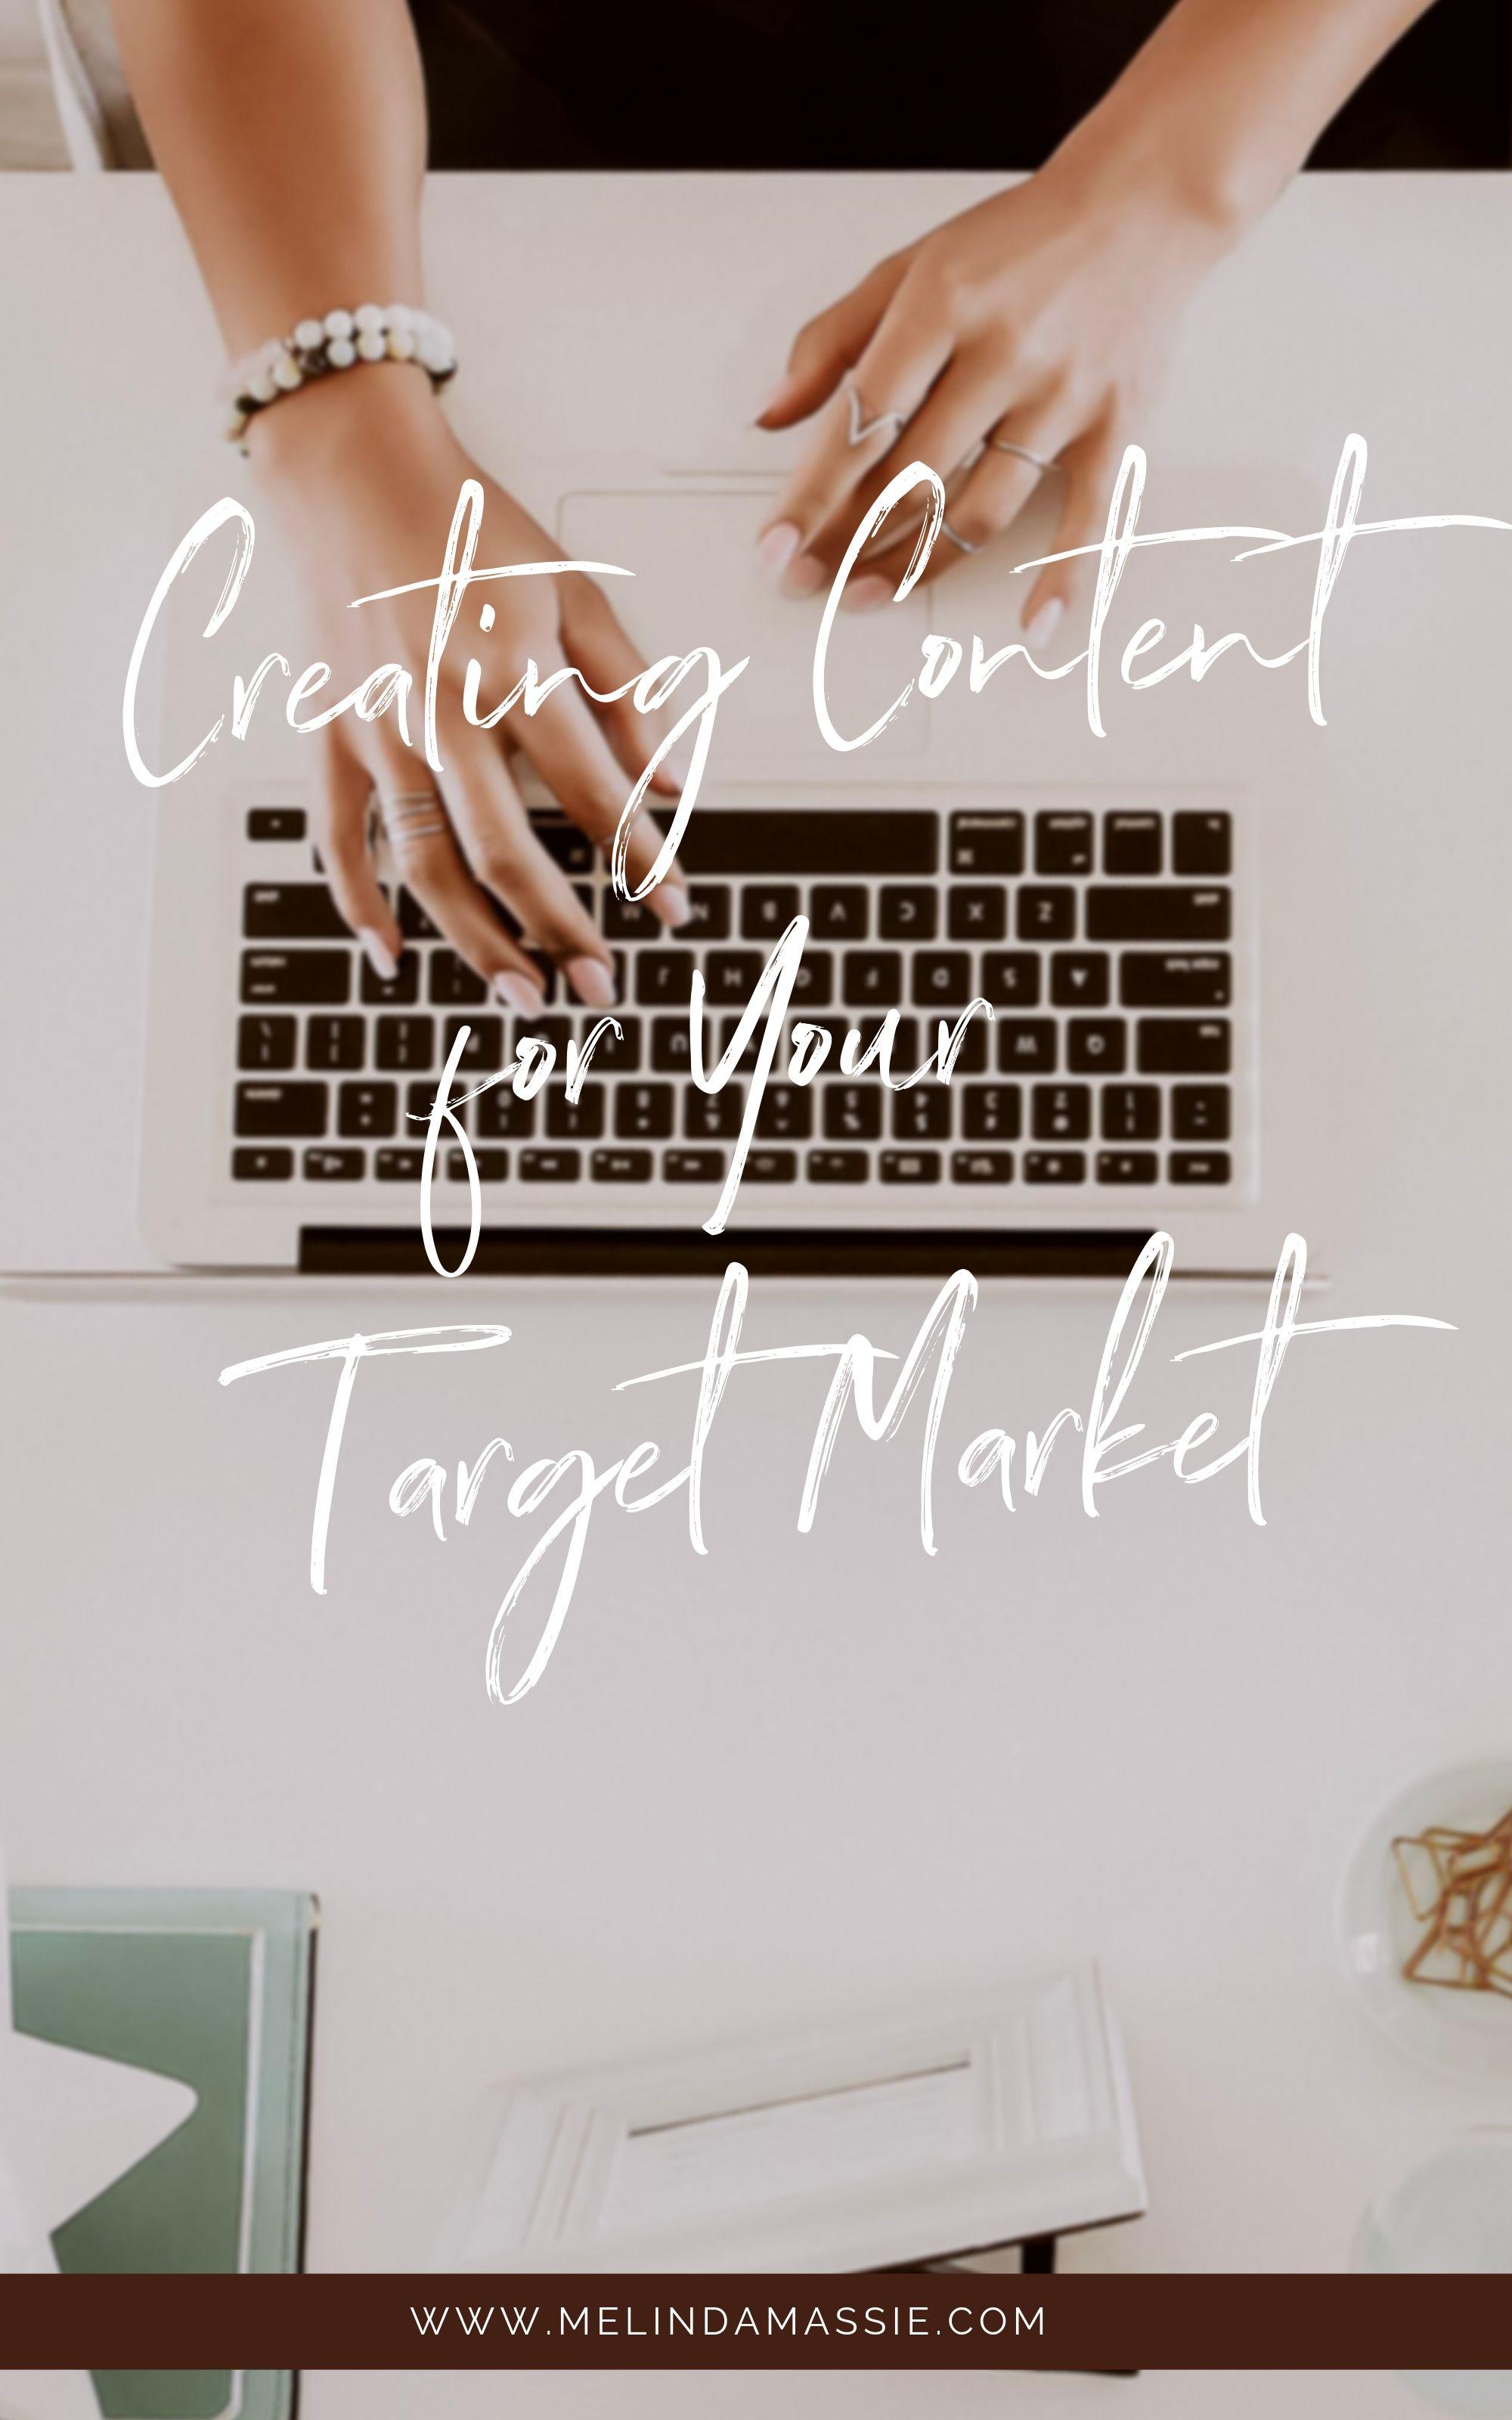 Creating Content for Your Target Market - Melinda Massie Marketing Blog